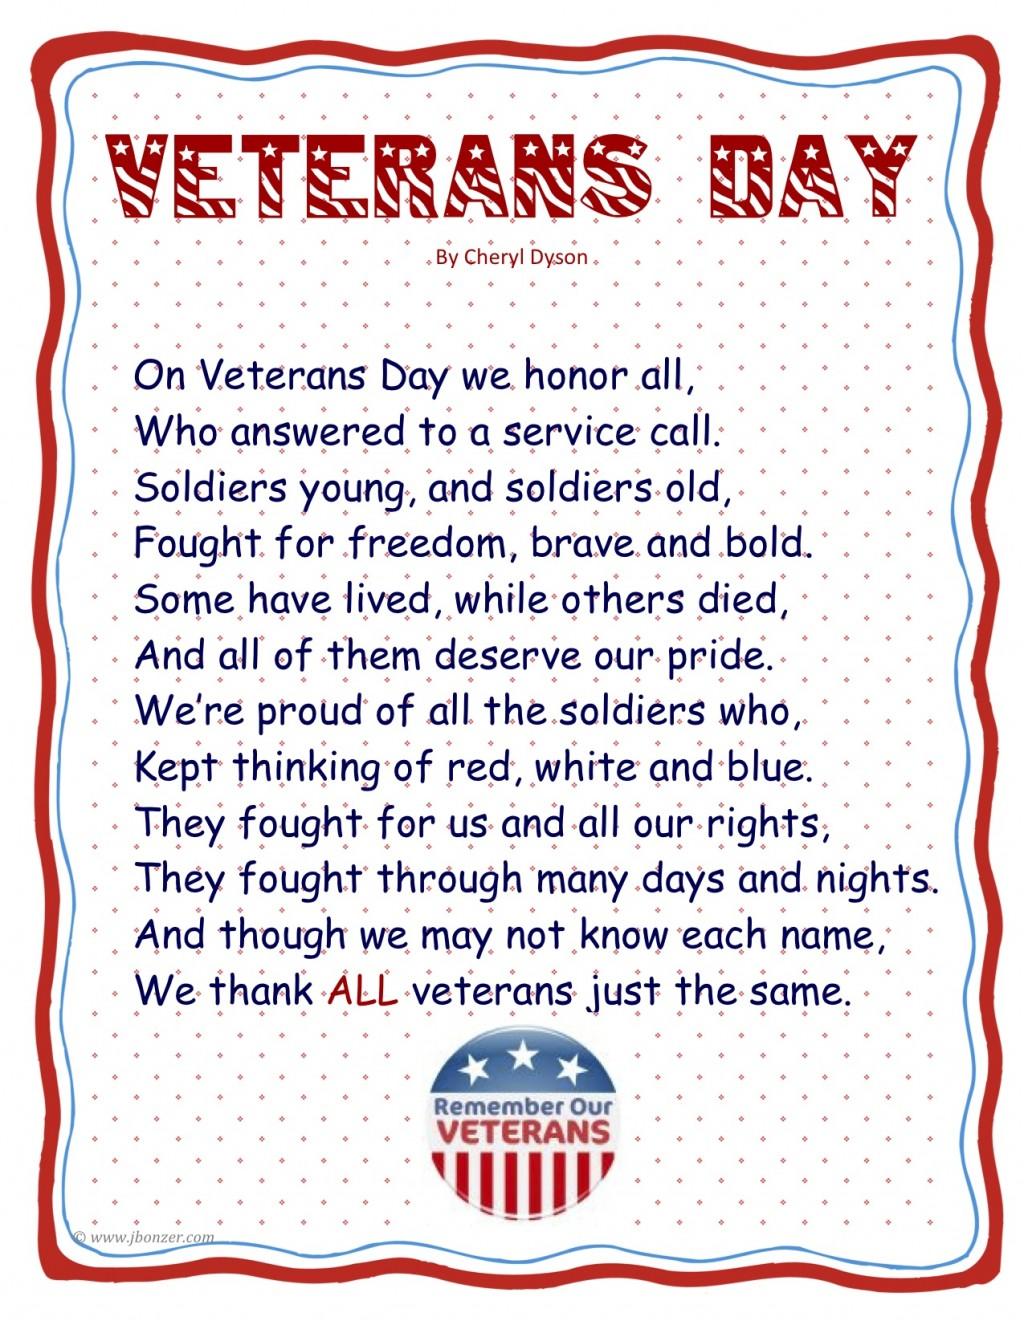 019 Essay Example Veteransdaypoembyjudybonzer3 Tuck Mba Marvelous Essays Sample Tips 2018 Large